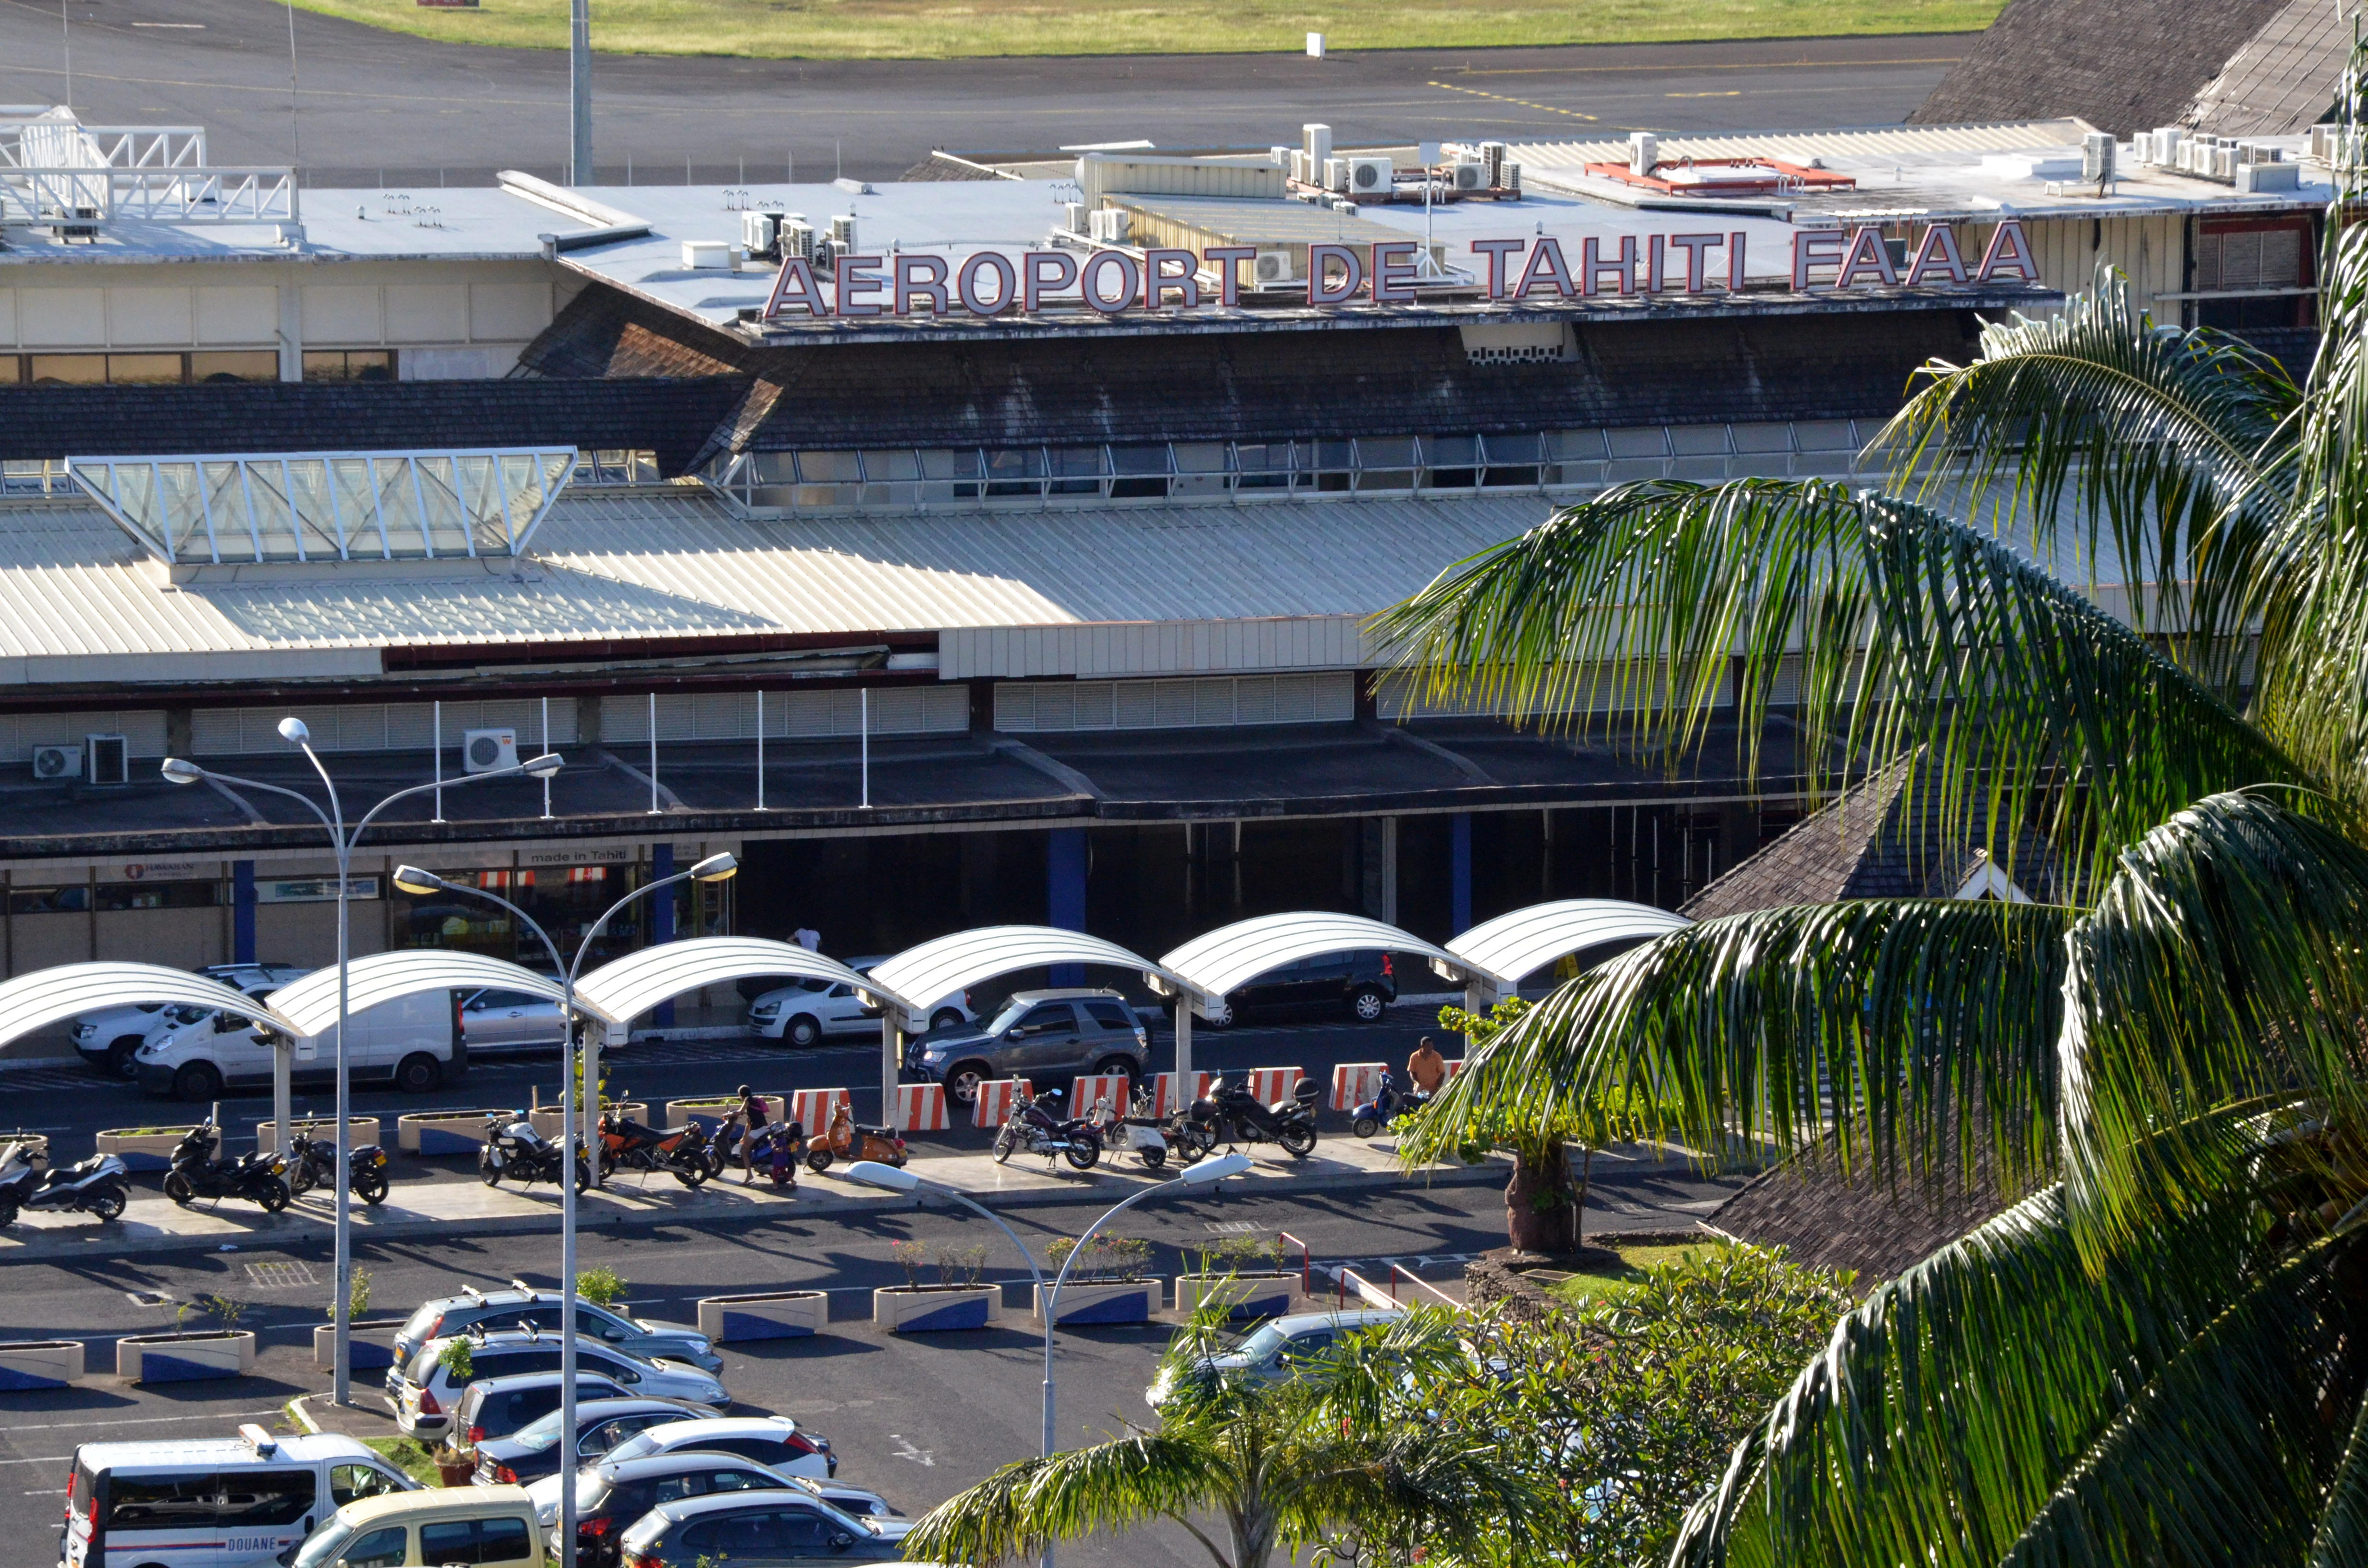 La gestion de l'aéroport de Tahiti discutée au conseil d'Etat